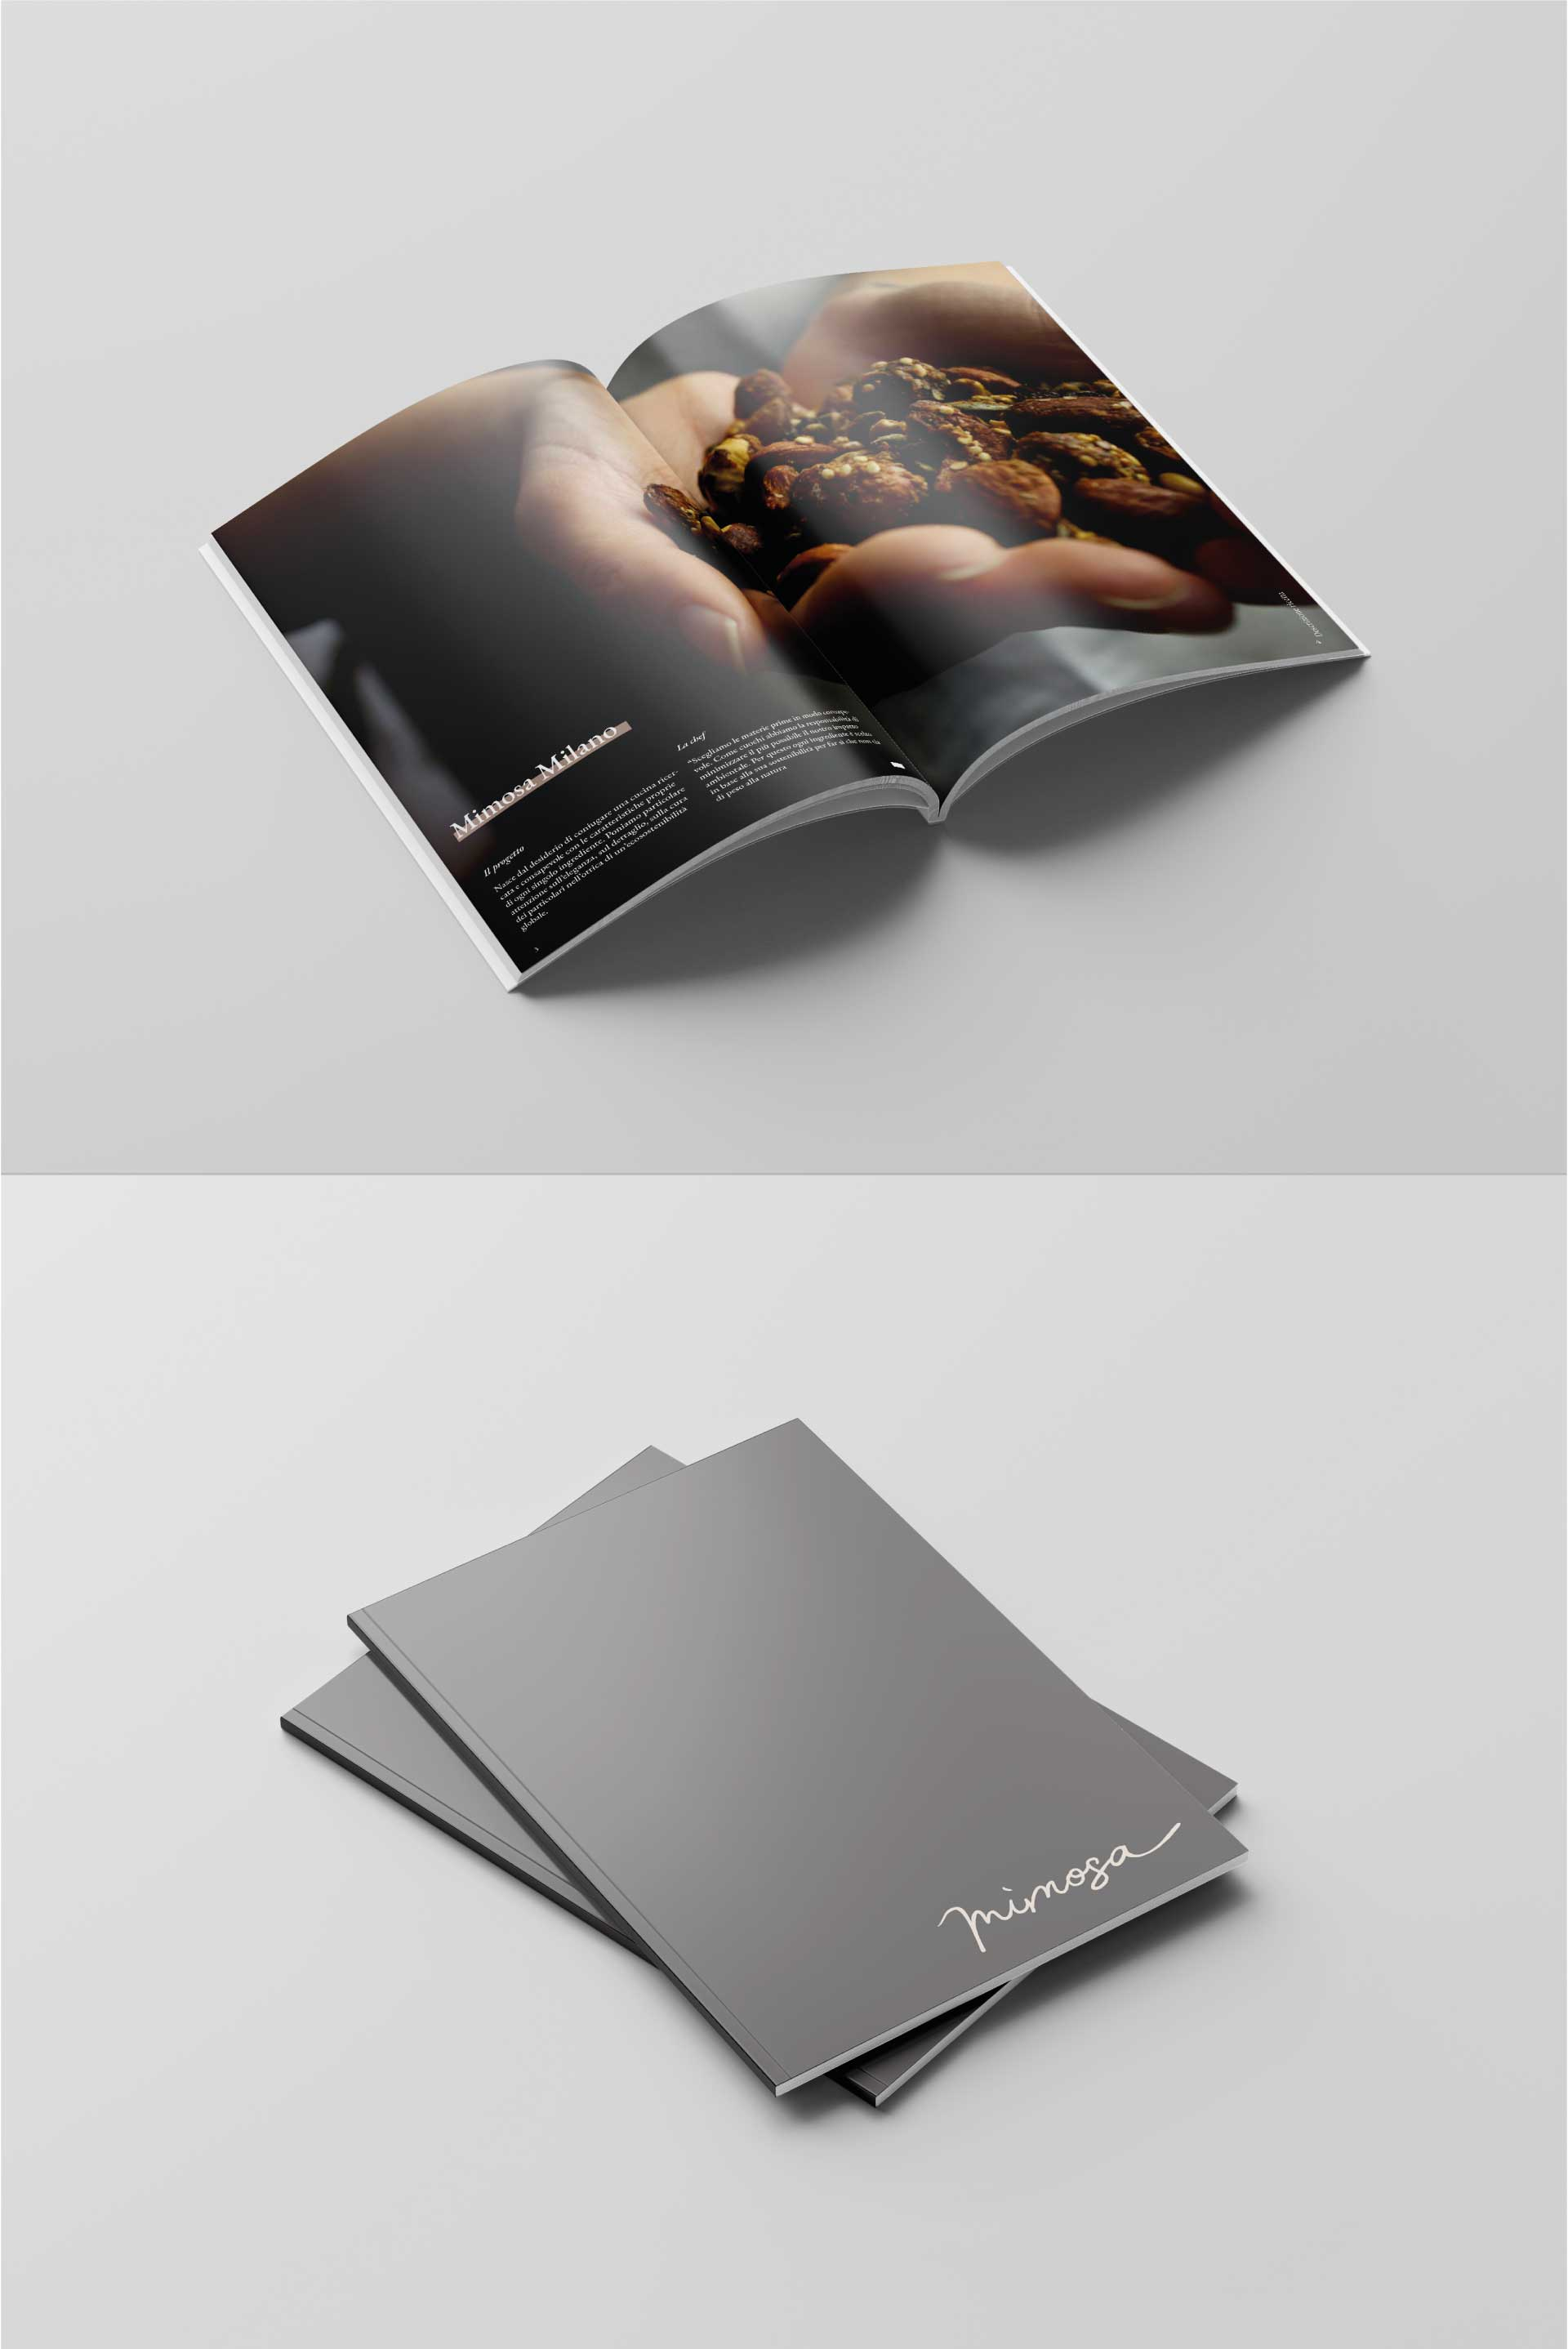 imosa moodmama sito brochure web branding social eventi portfolio.broghre copertina interno.jpg